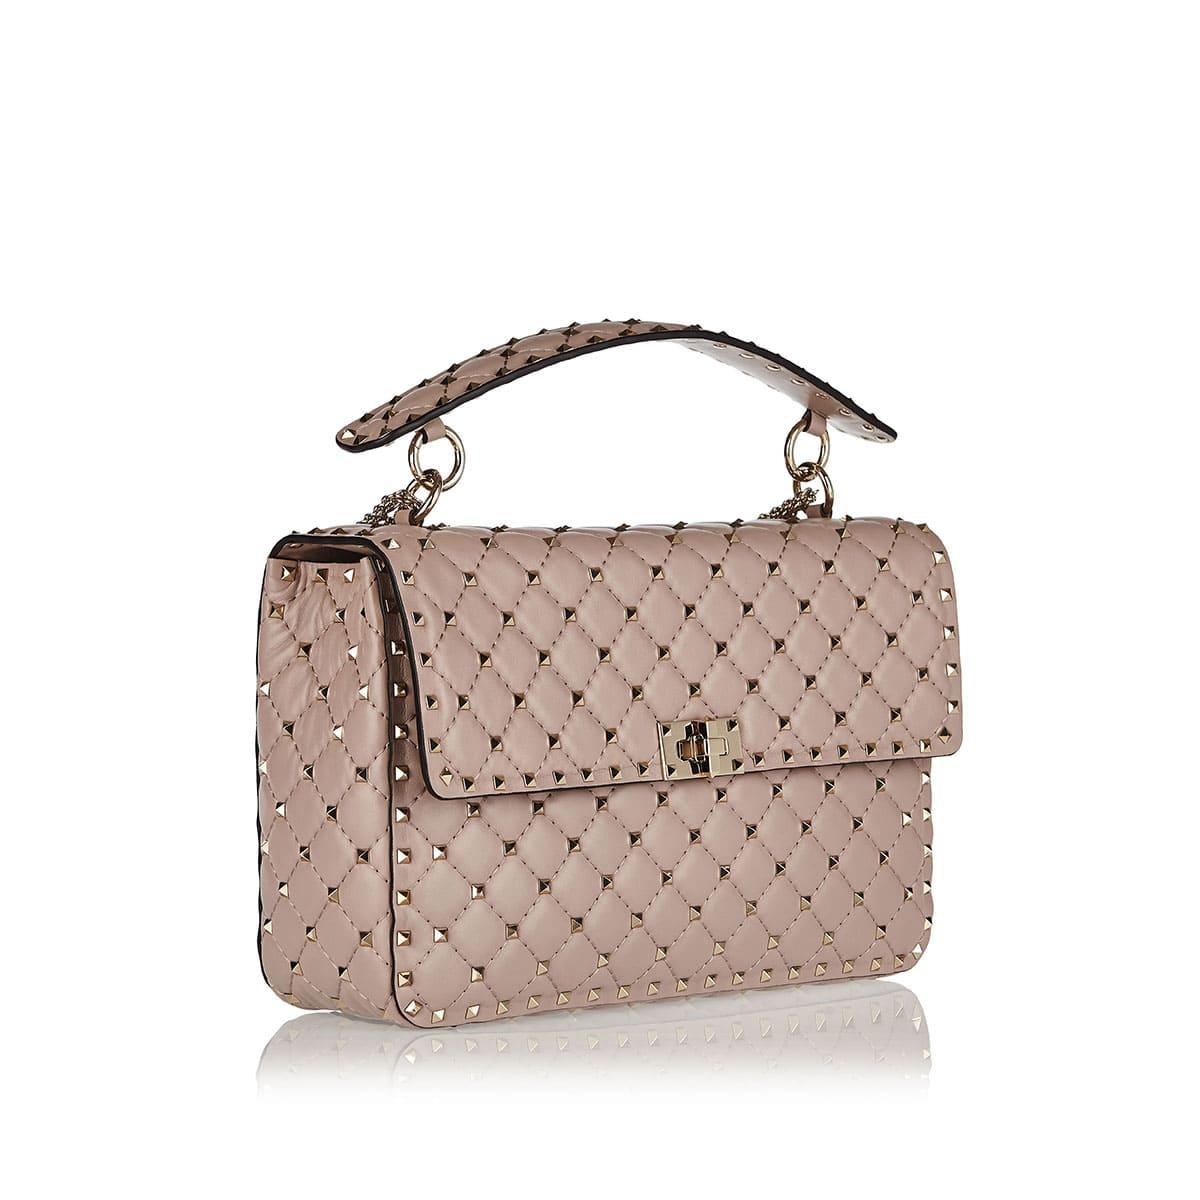 Rockstud Spike leather chain bag